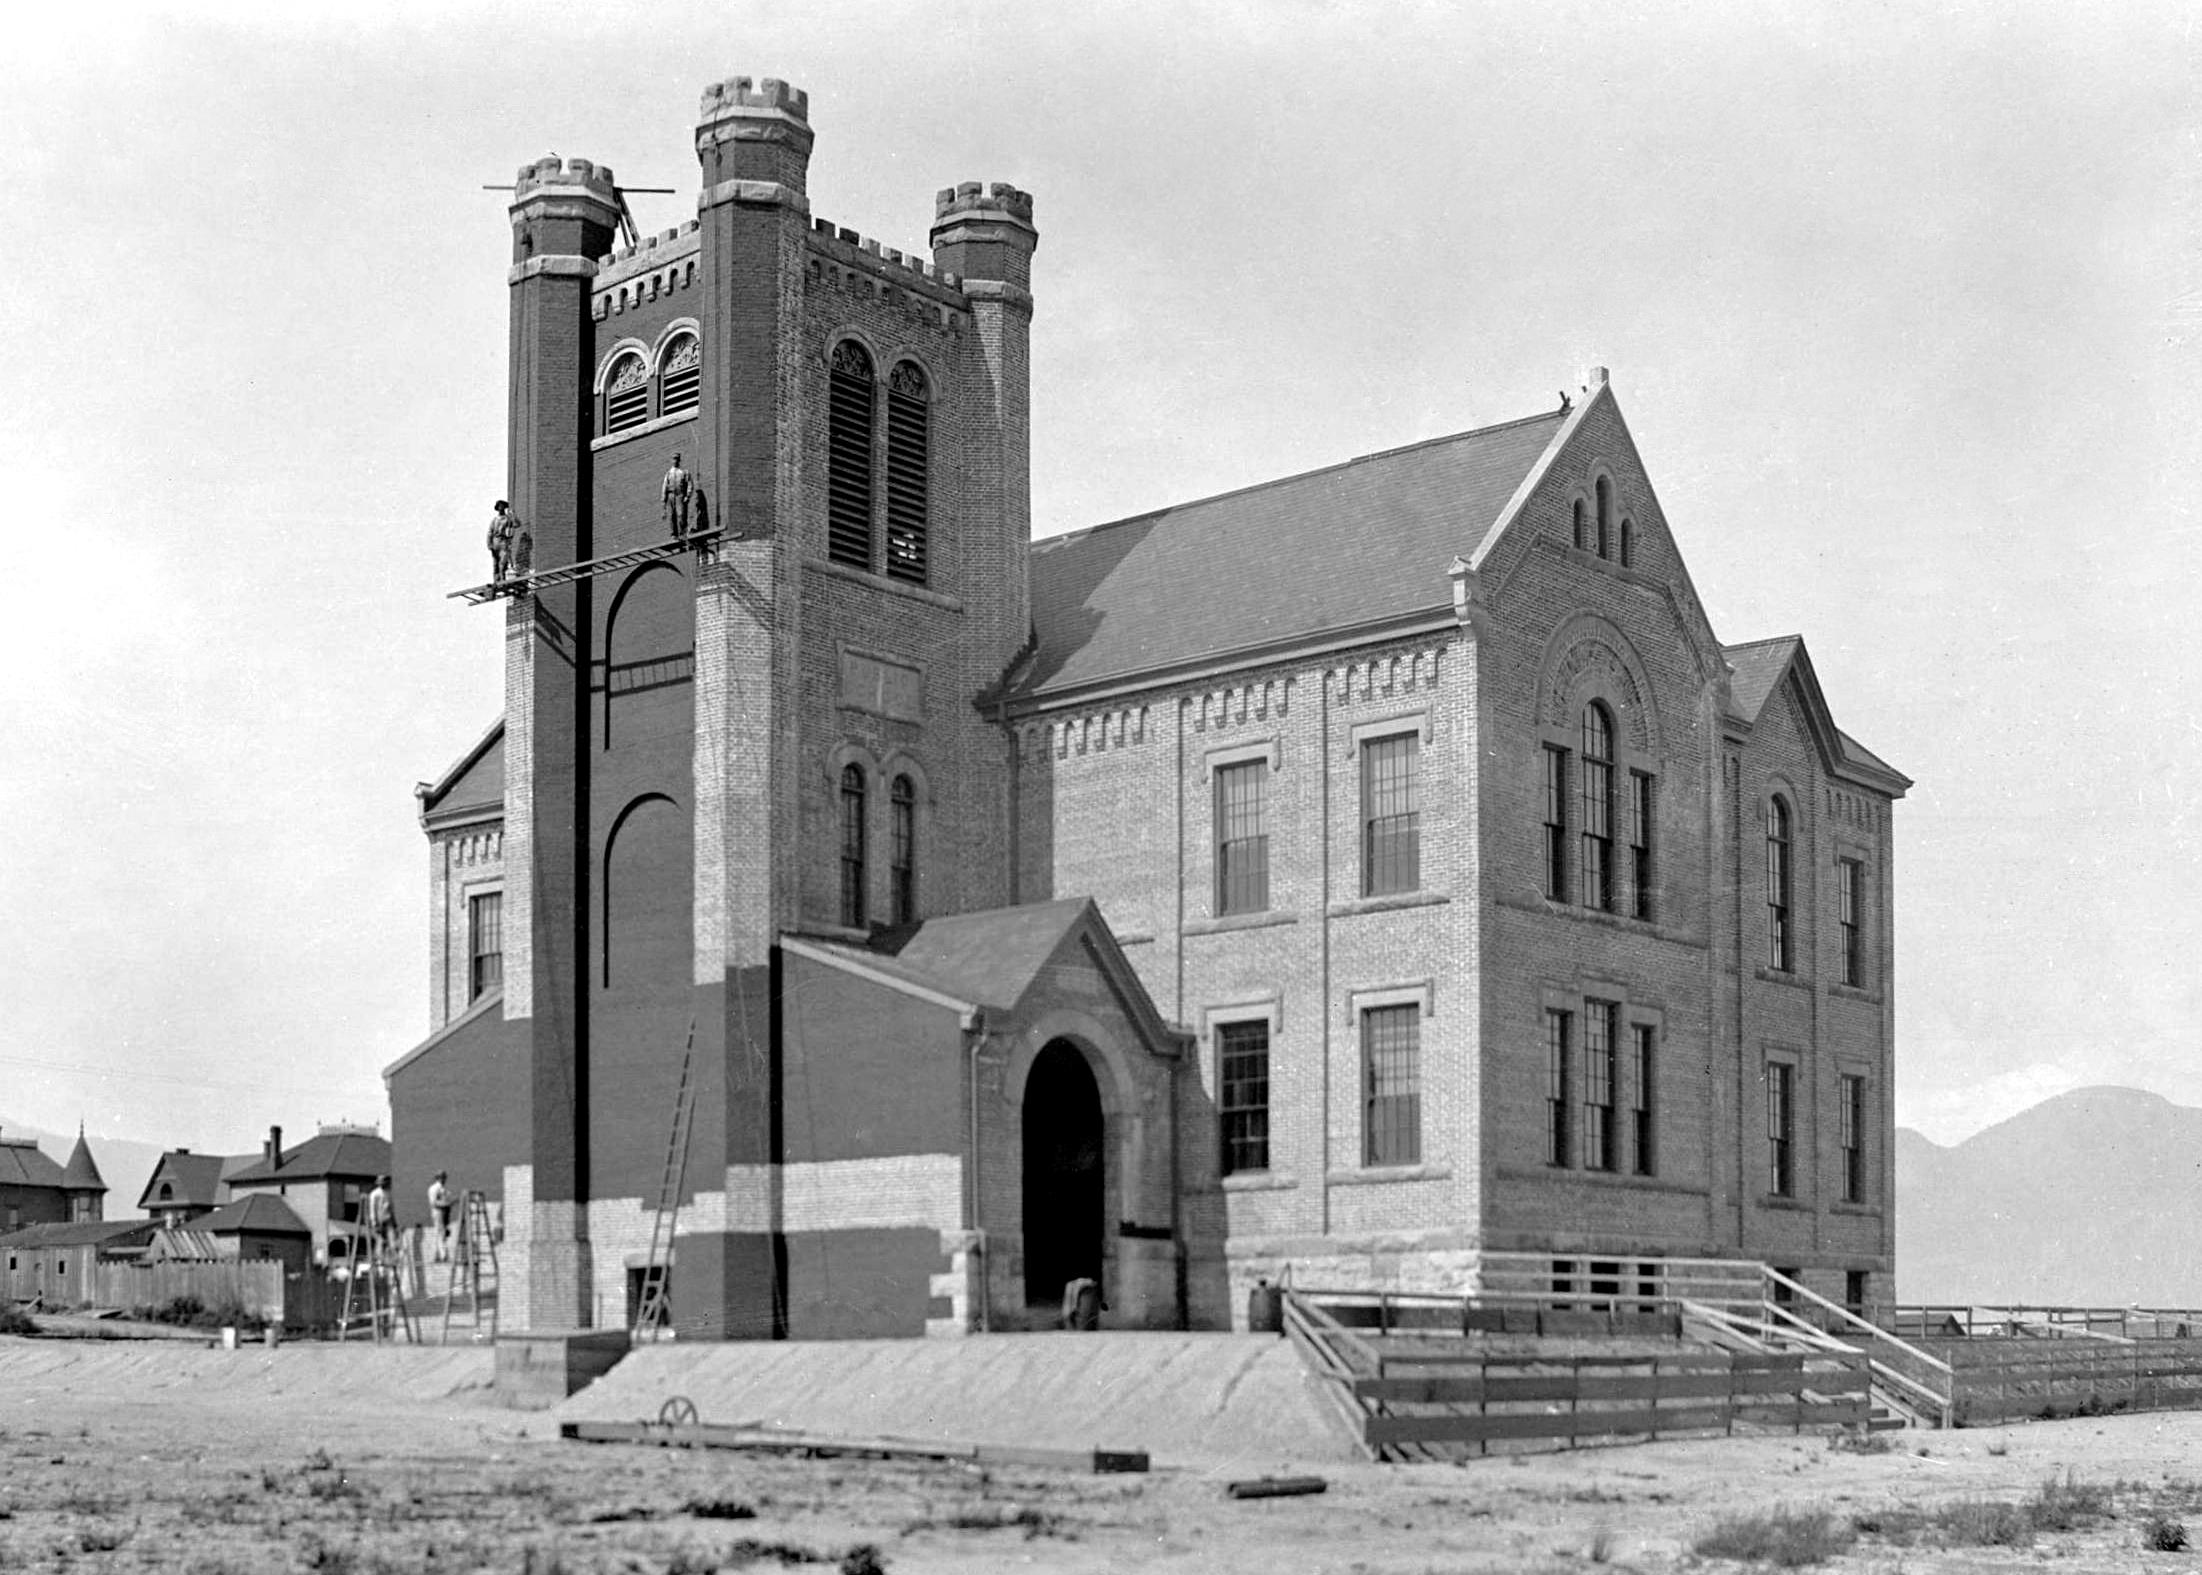 1394123d-a59f-4d83-af19-a64f423a9c1a-a03953-1892west1888-renamed-dawson-school-in-1900